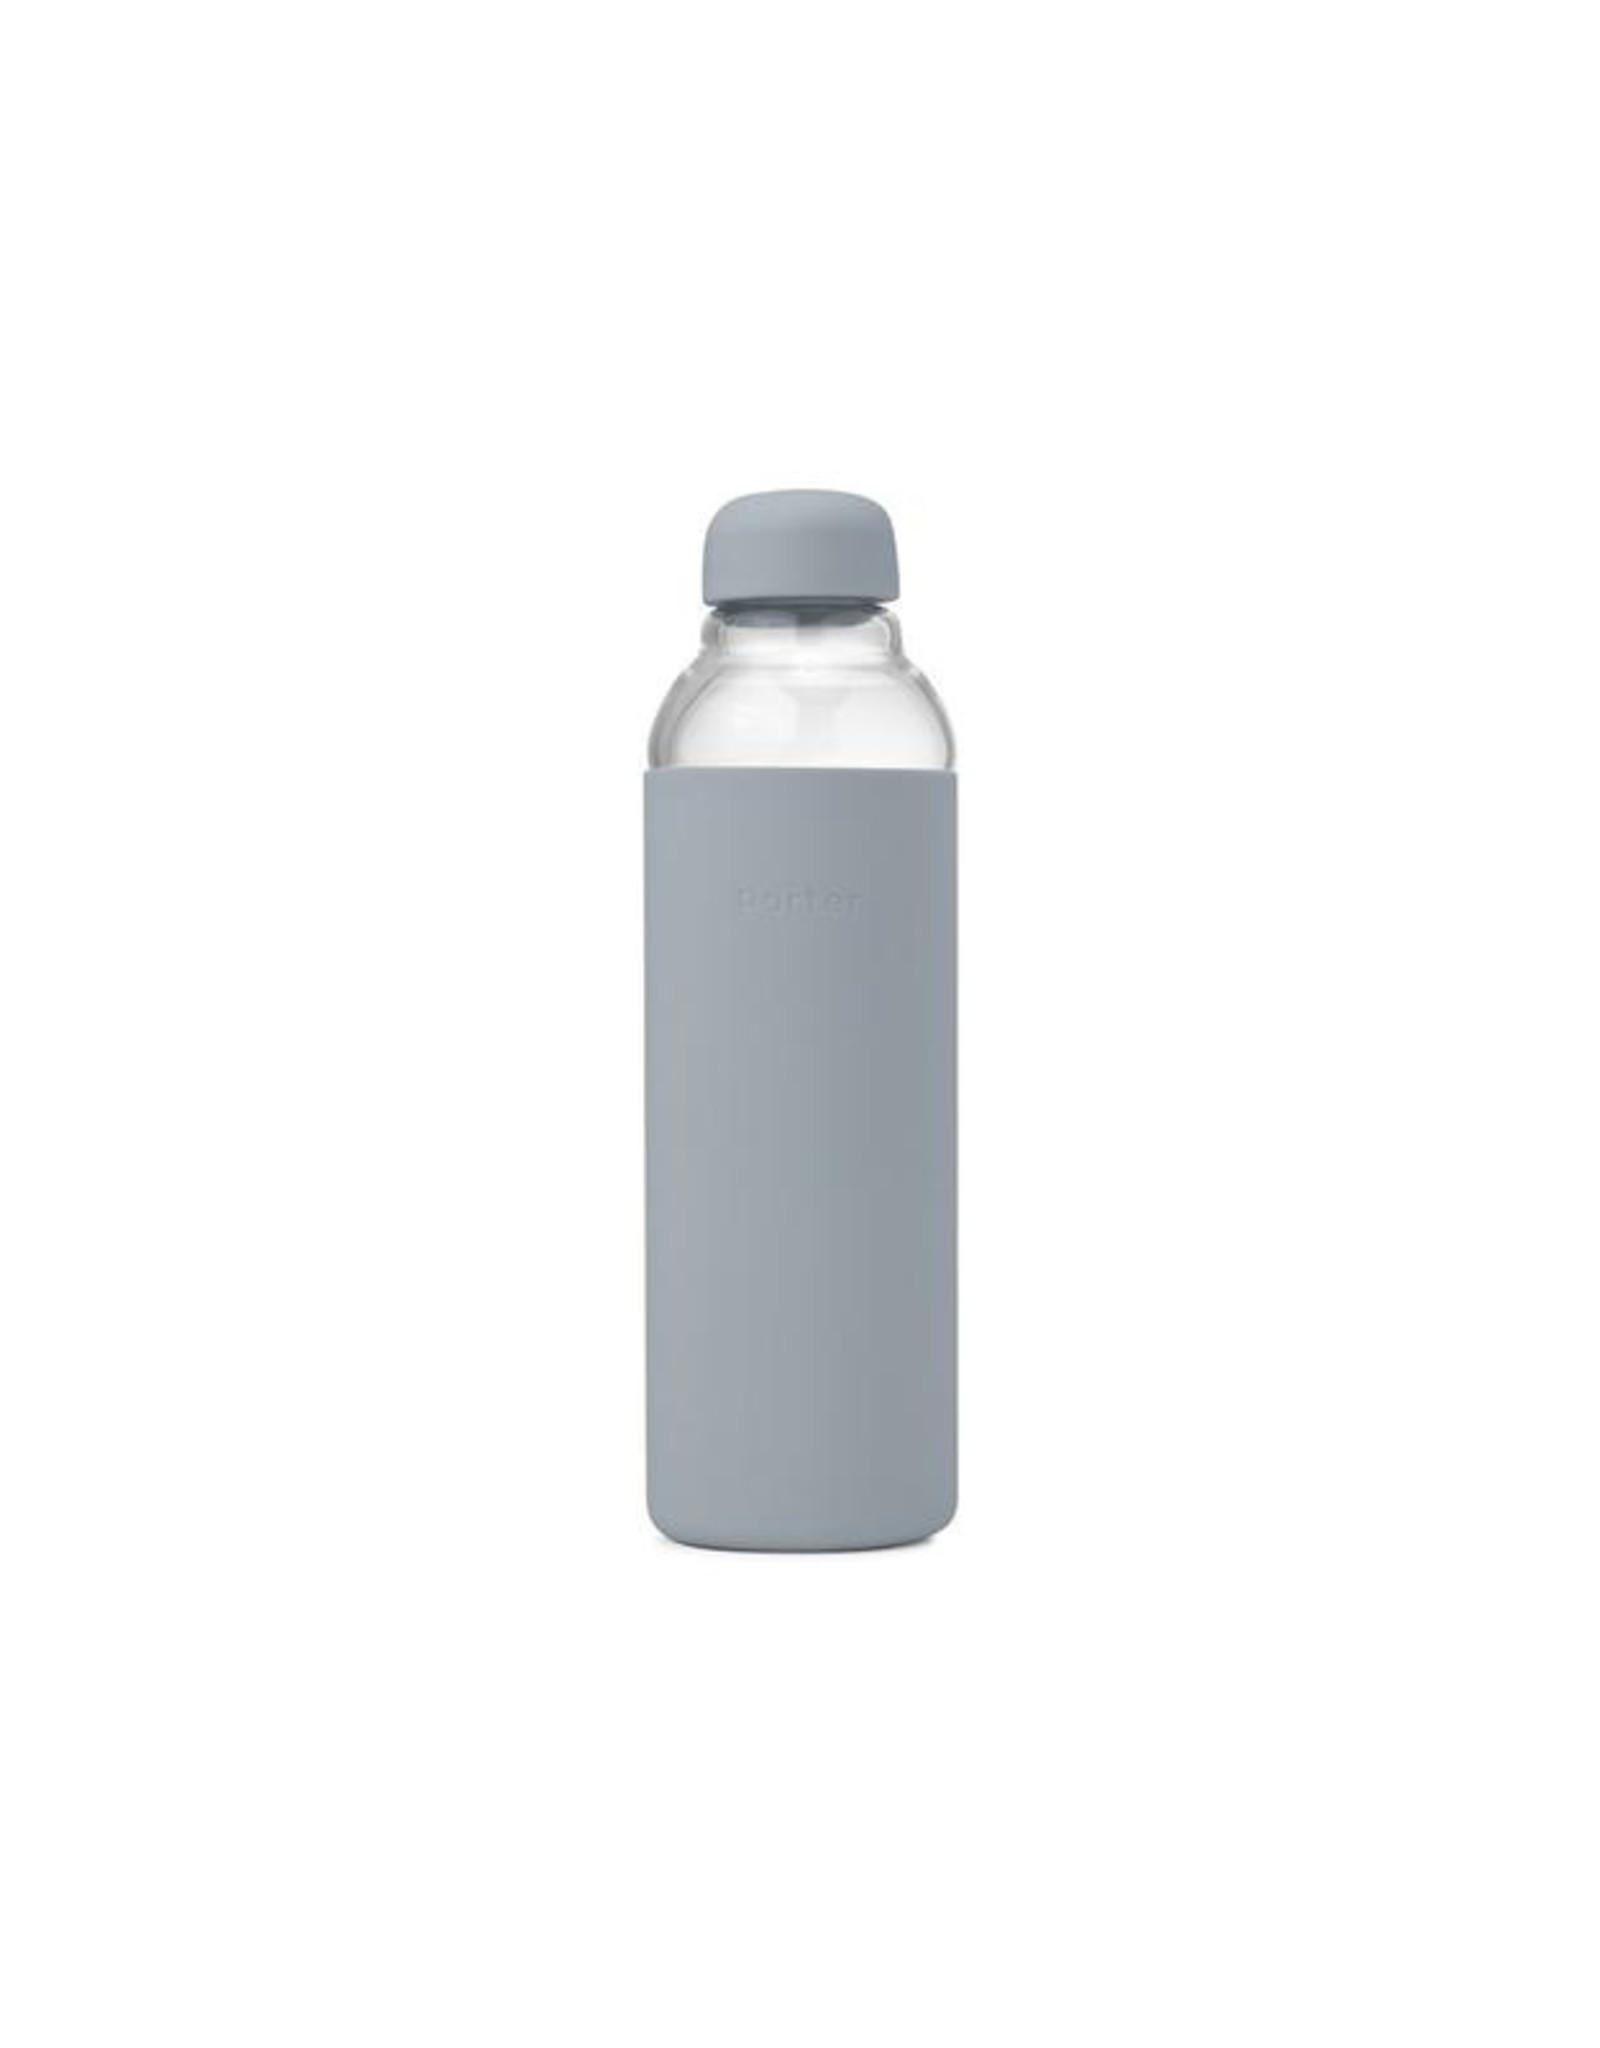 W&P Design Porter Water Bottle